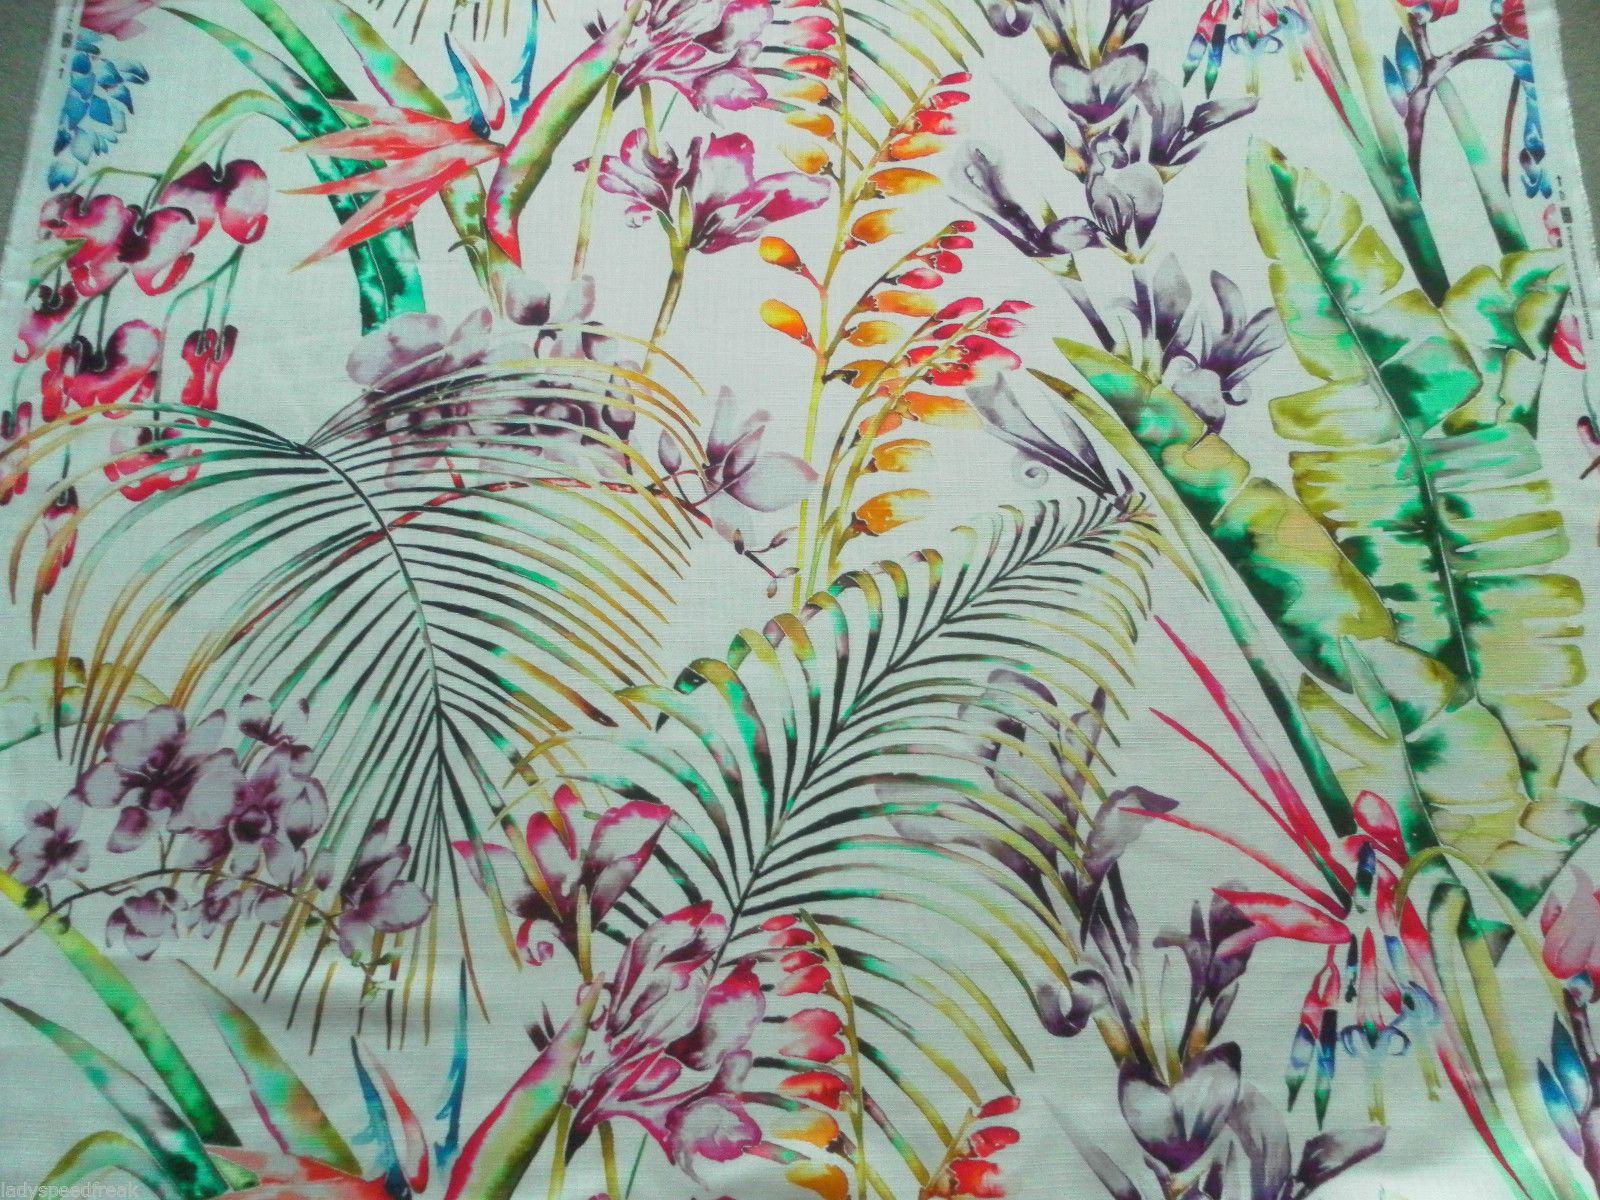 Products harlequin designer fabrics and wallpapers paradise - Harlequin Curtain Fabric Paradise 1 8m Flamingo Papaya Tropical Floral Design